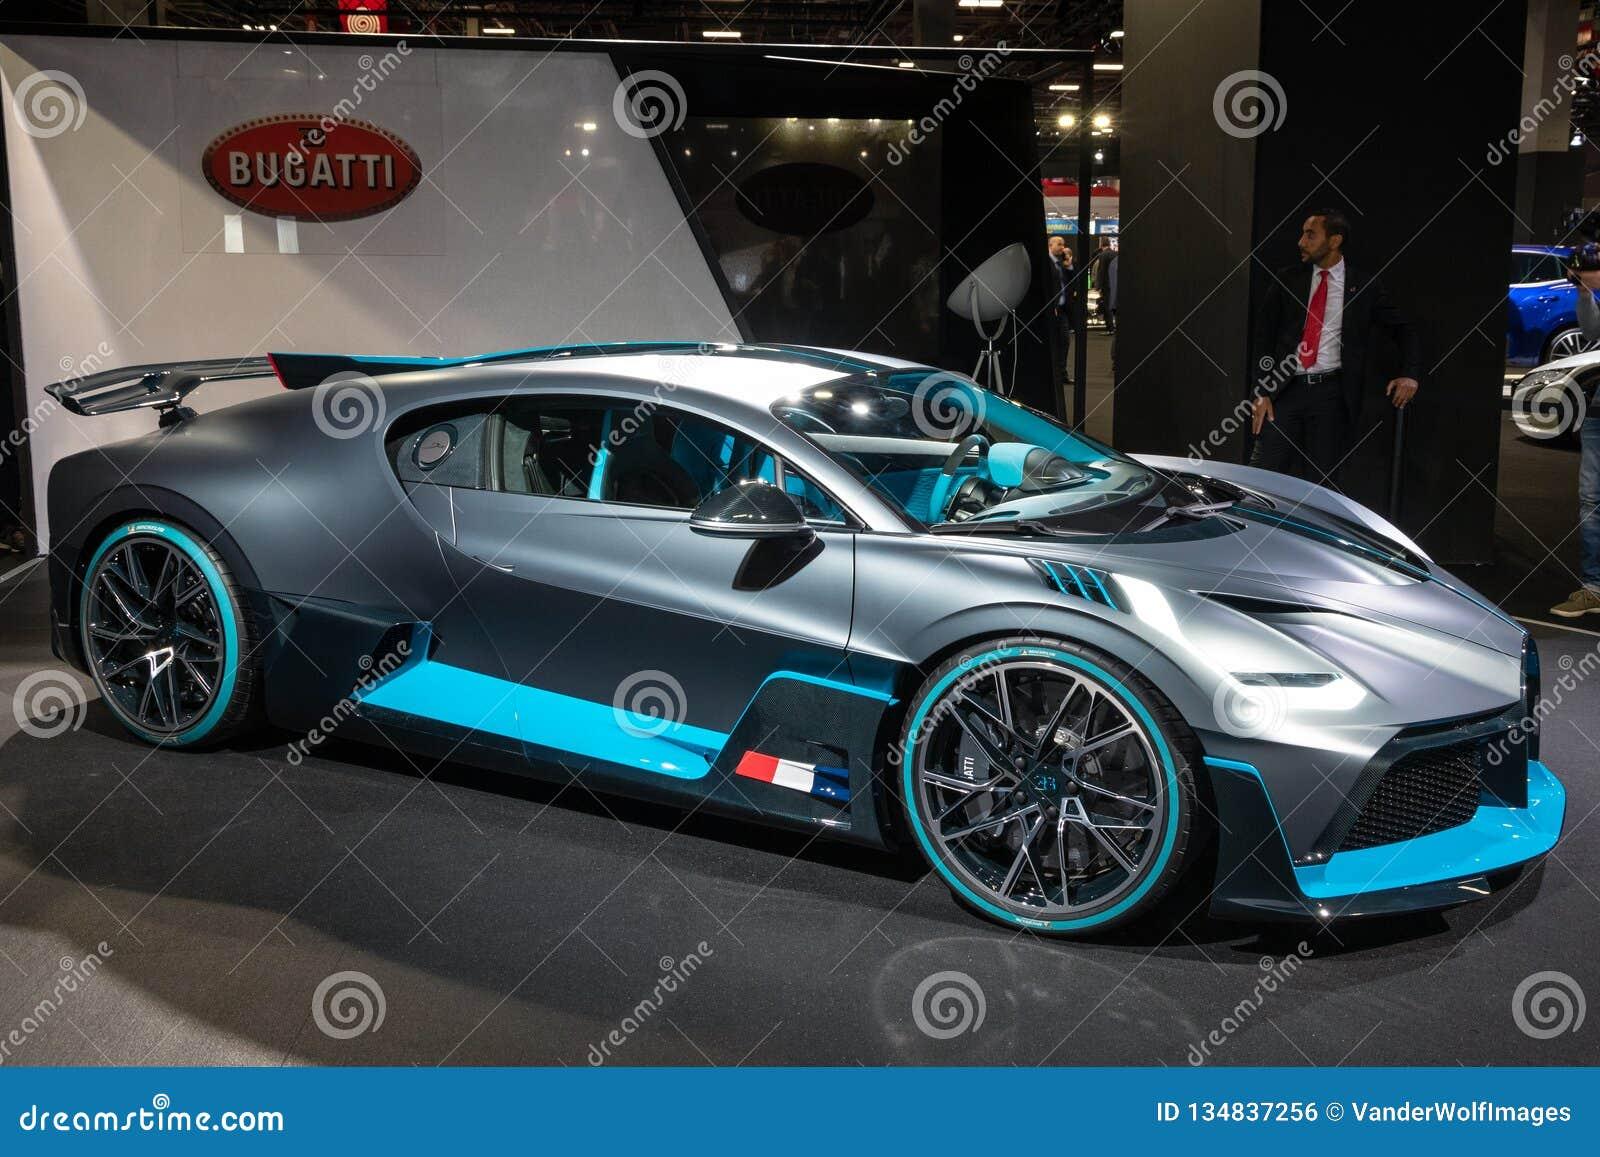 New 2020 Bugatti Divo Extreme Hypercar Editorial Photo Image Of Sports Autoshow 134837256